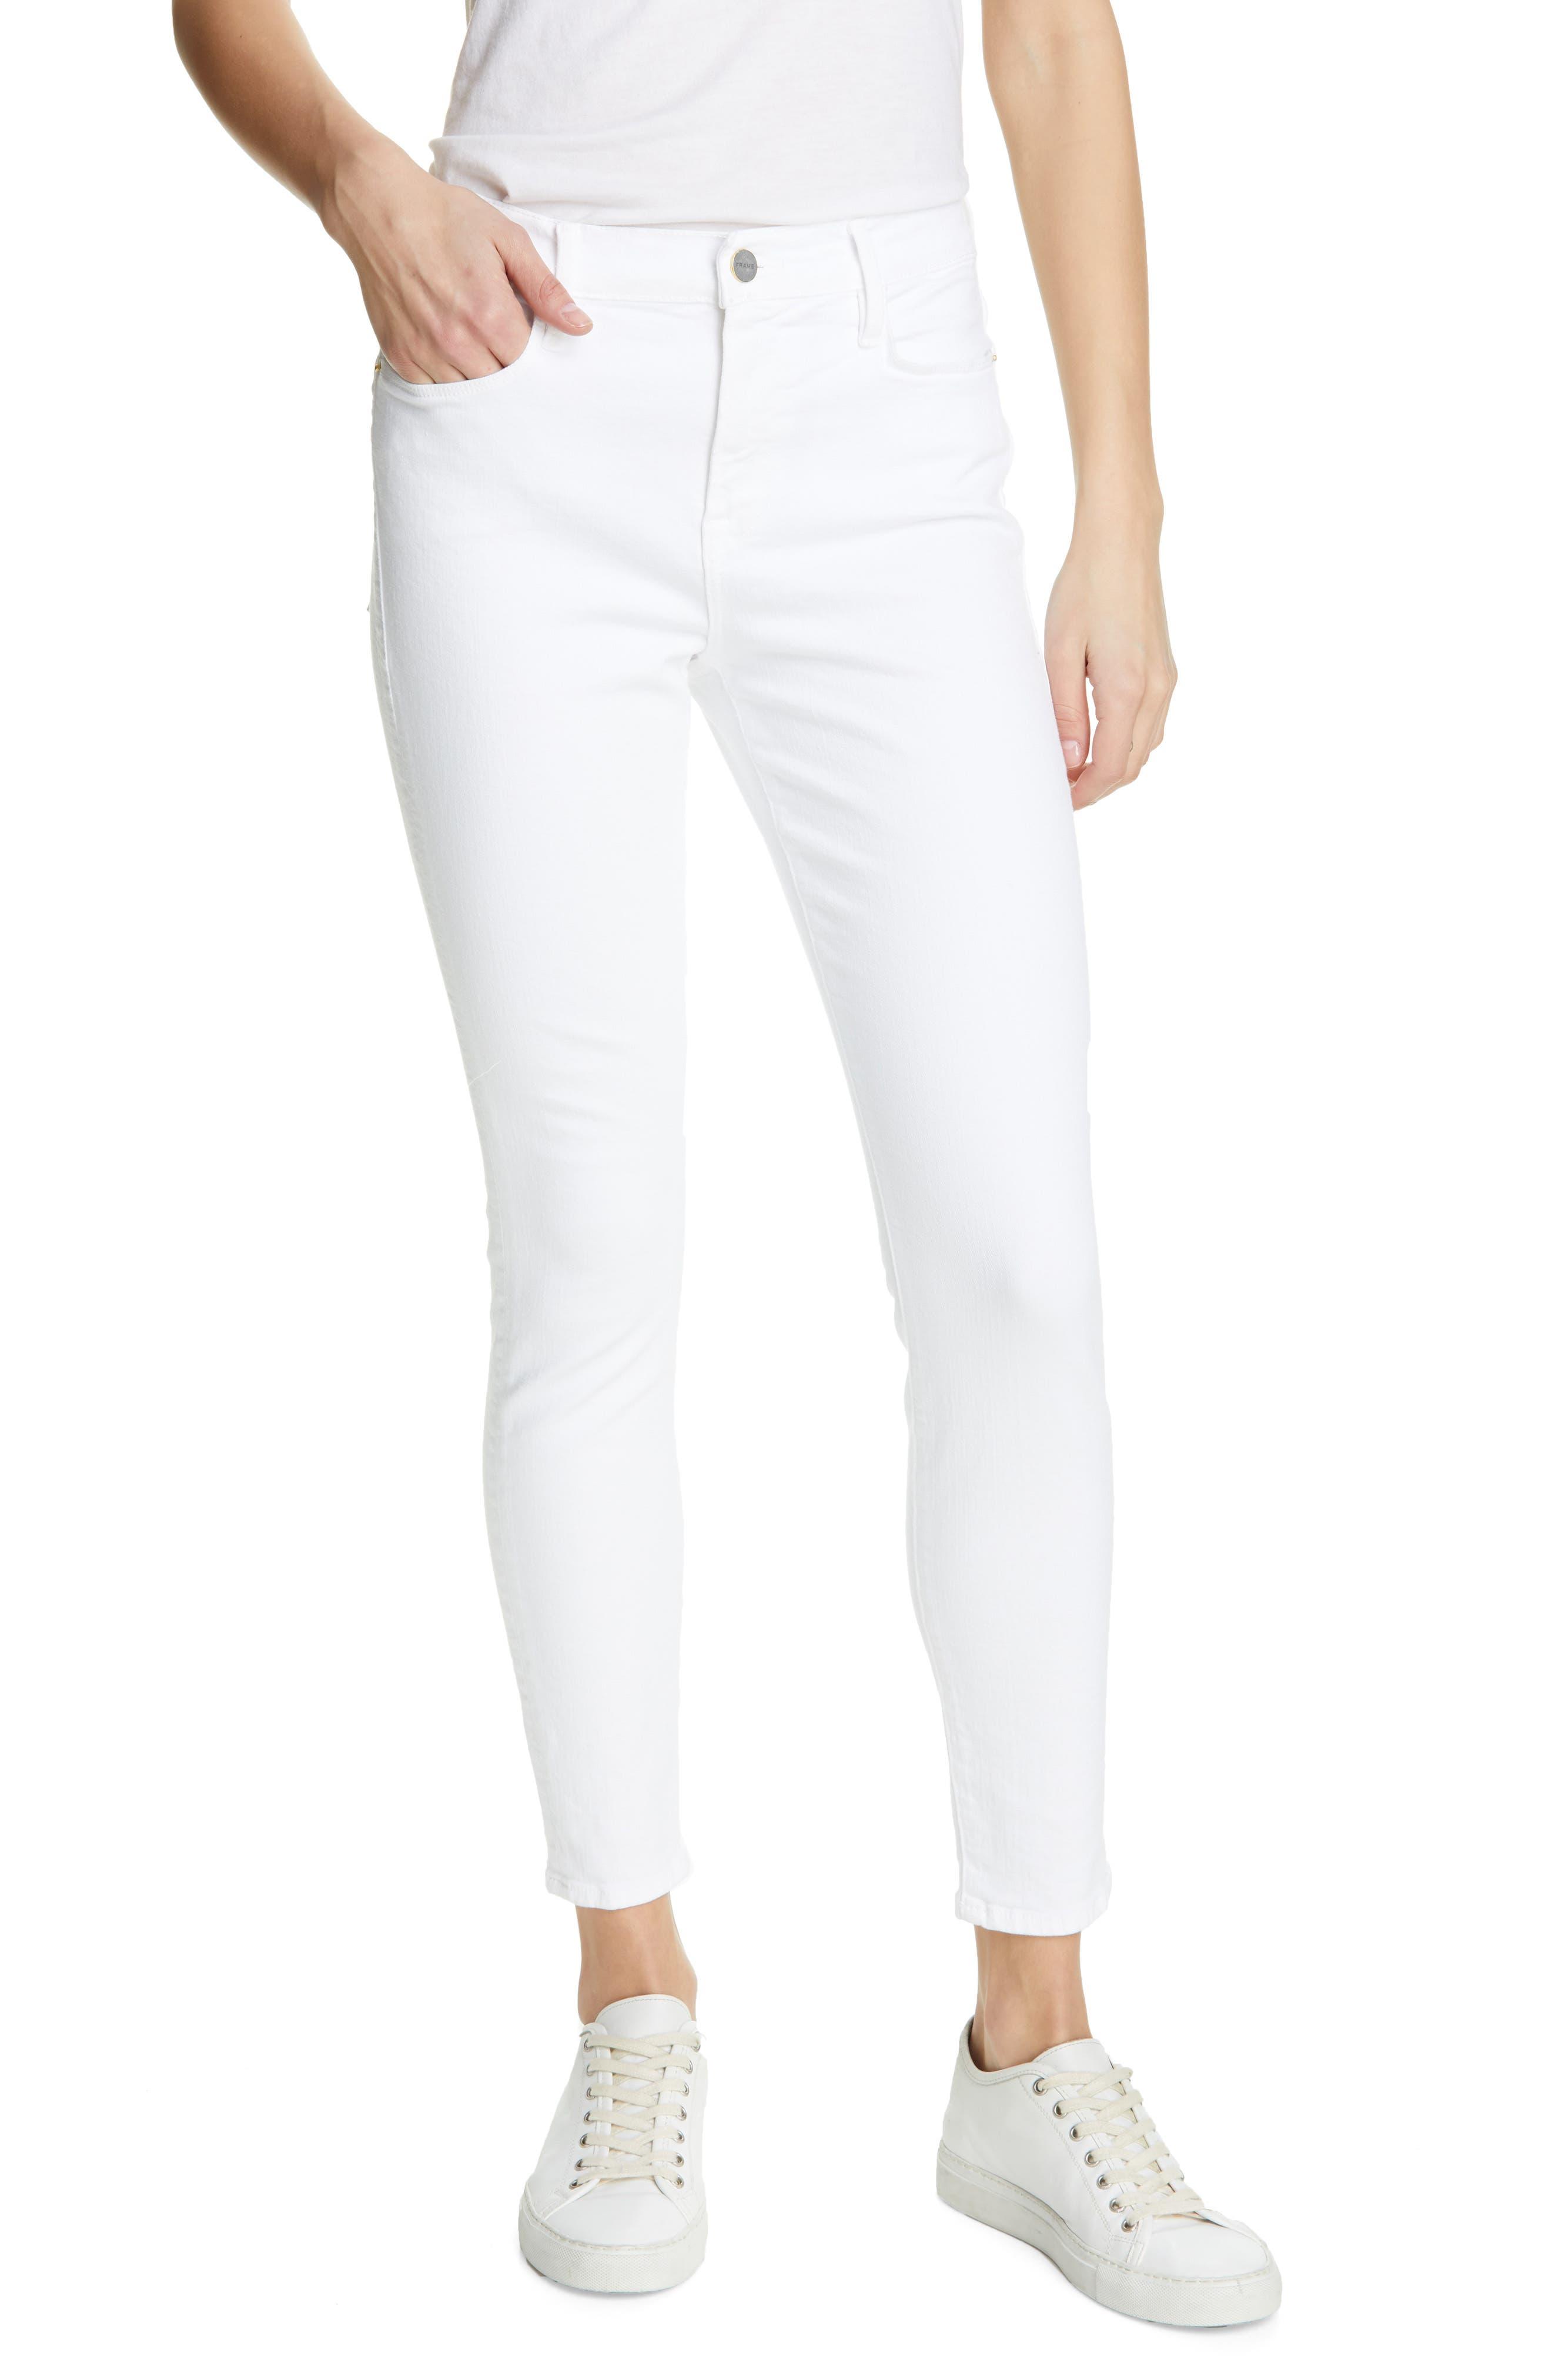 Frame Denims High Waist Ankle Skinny Jeans